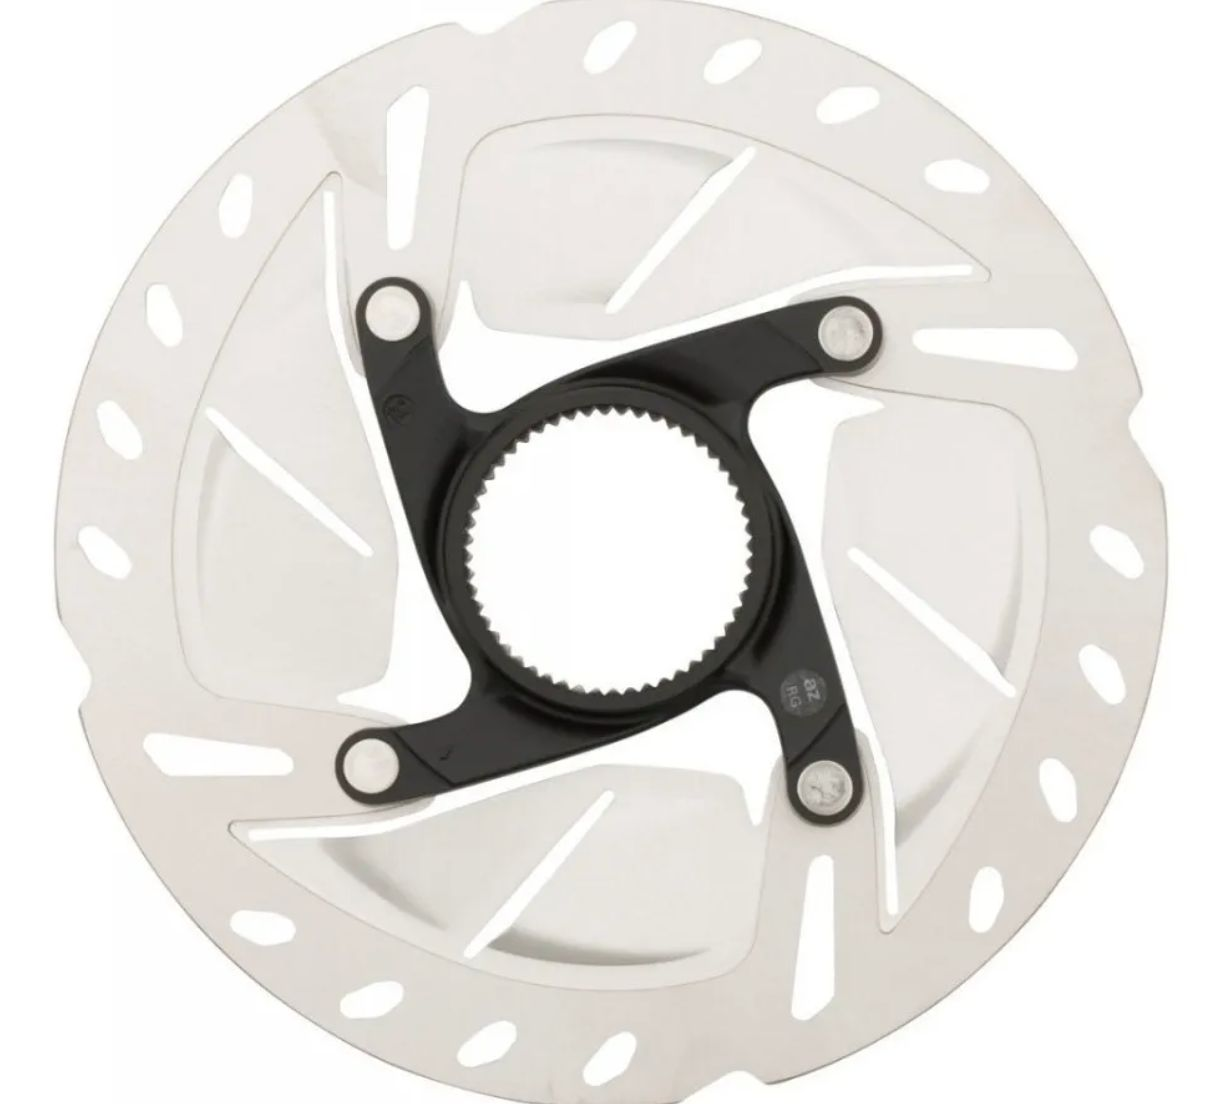 Disco Freio Rotor Shimano Rt800 140mm Freeza Ultegra Ice Tec